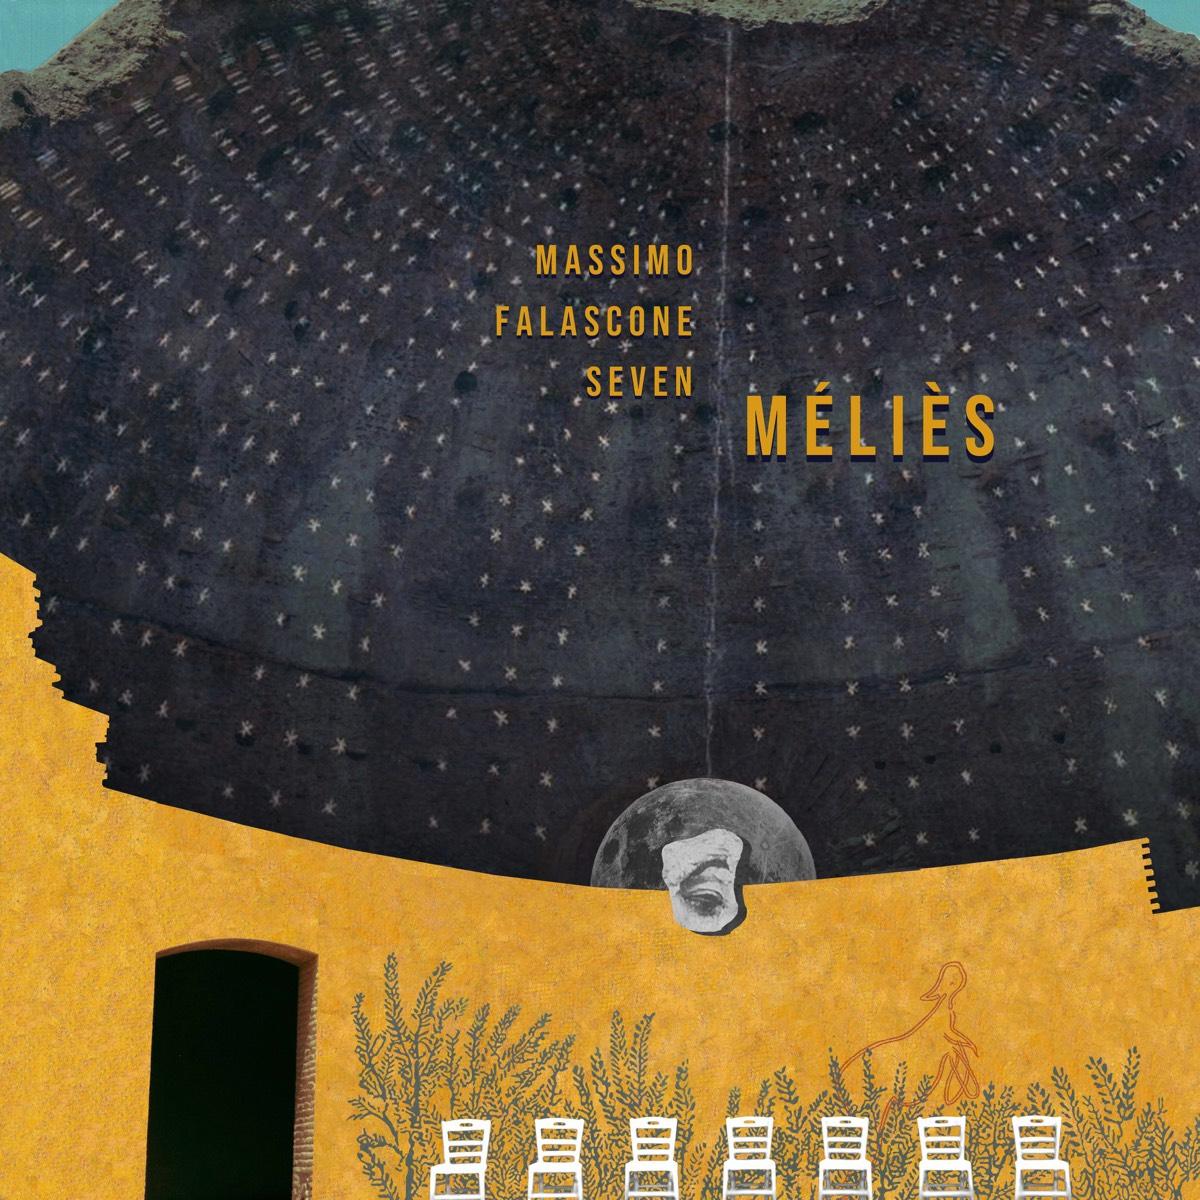 MASSIMO FALASCONE SEVEN, Méliès